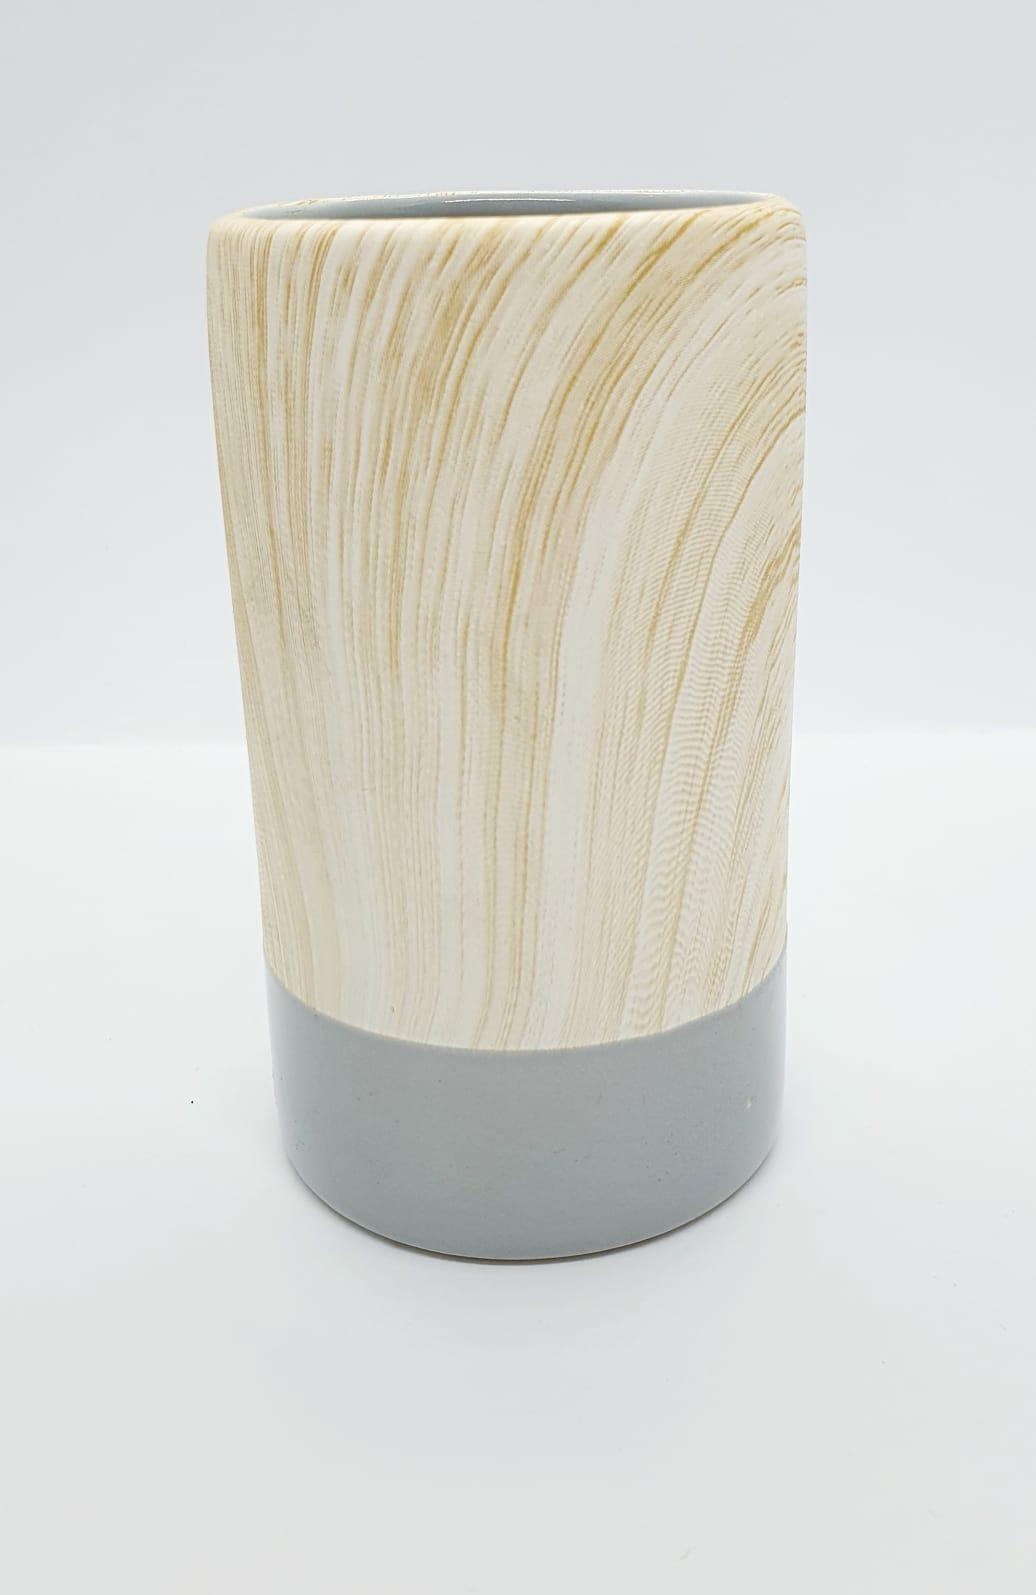 Vaso decorativo em porcelana marmorizado colors - cinza